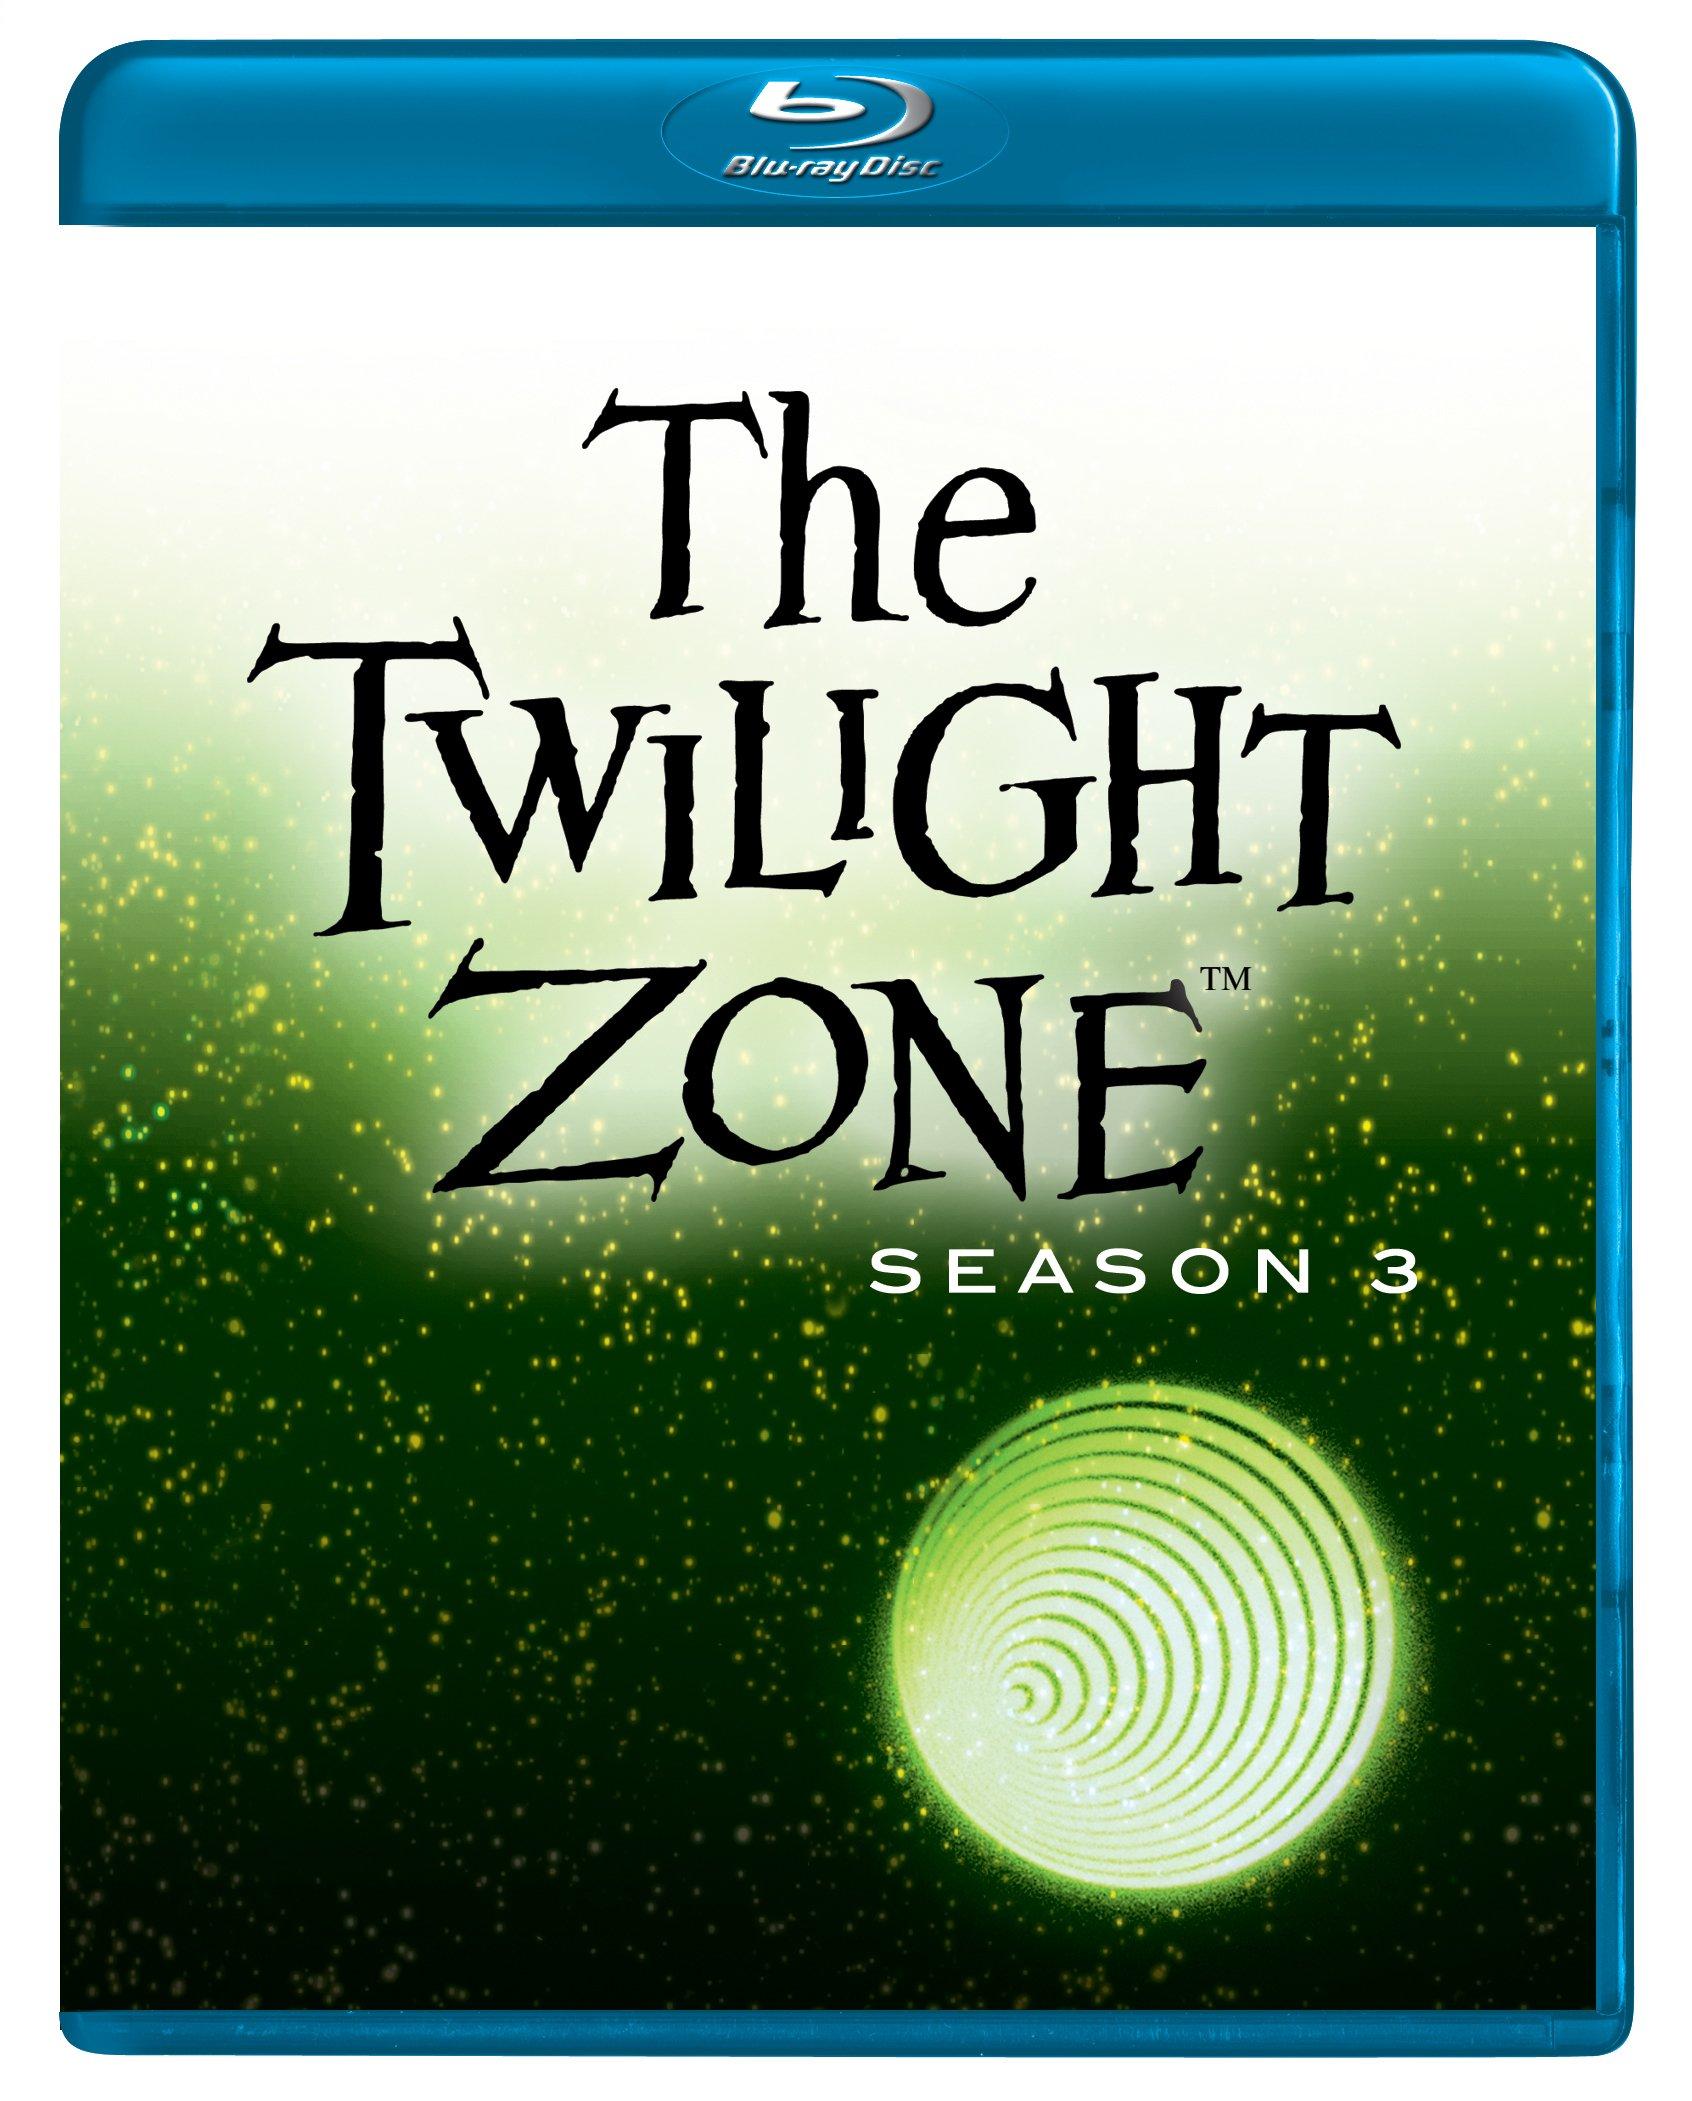 The Twilight Zone: Season 3 [Blu-ray] by Image Entertainment